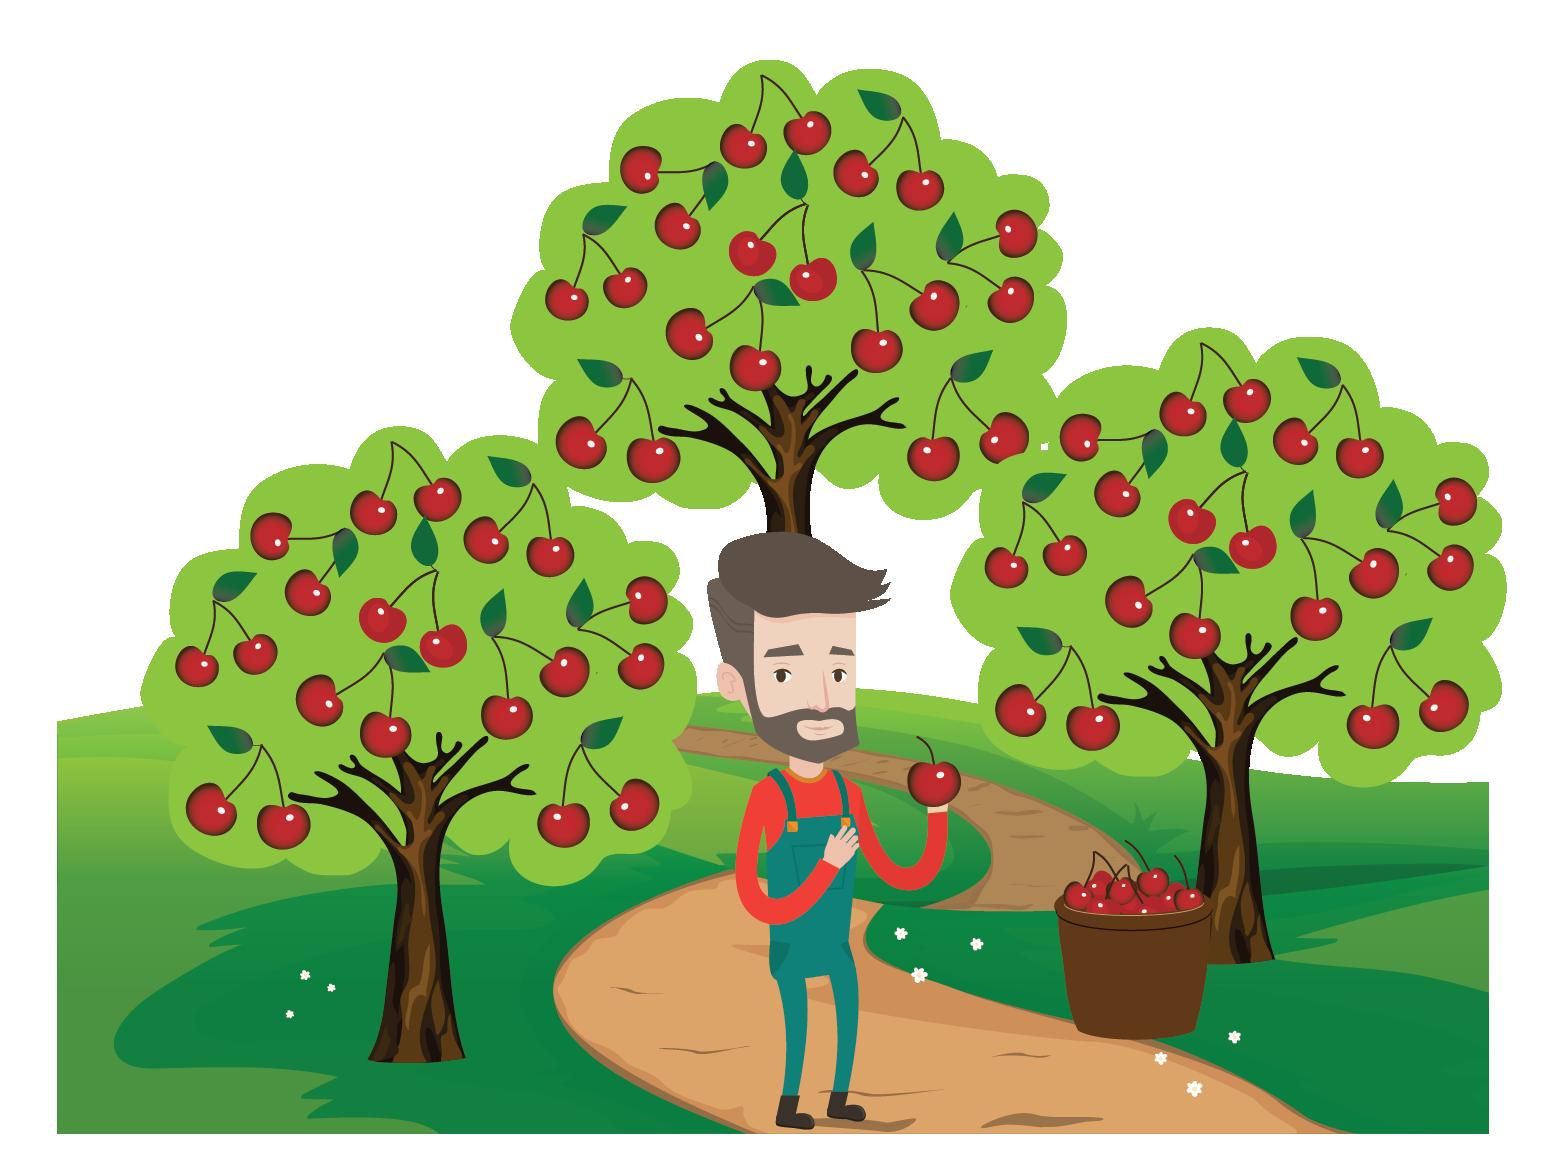 Histogram example of a cherry tree garden